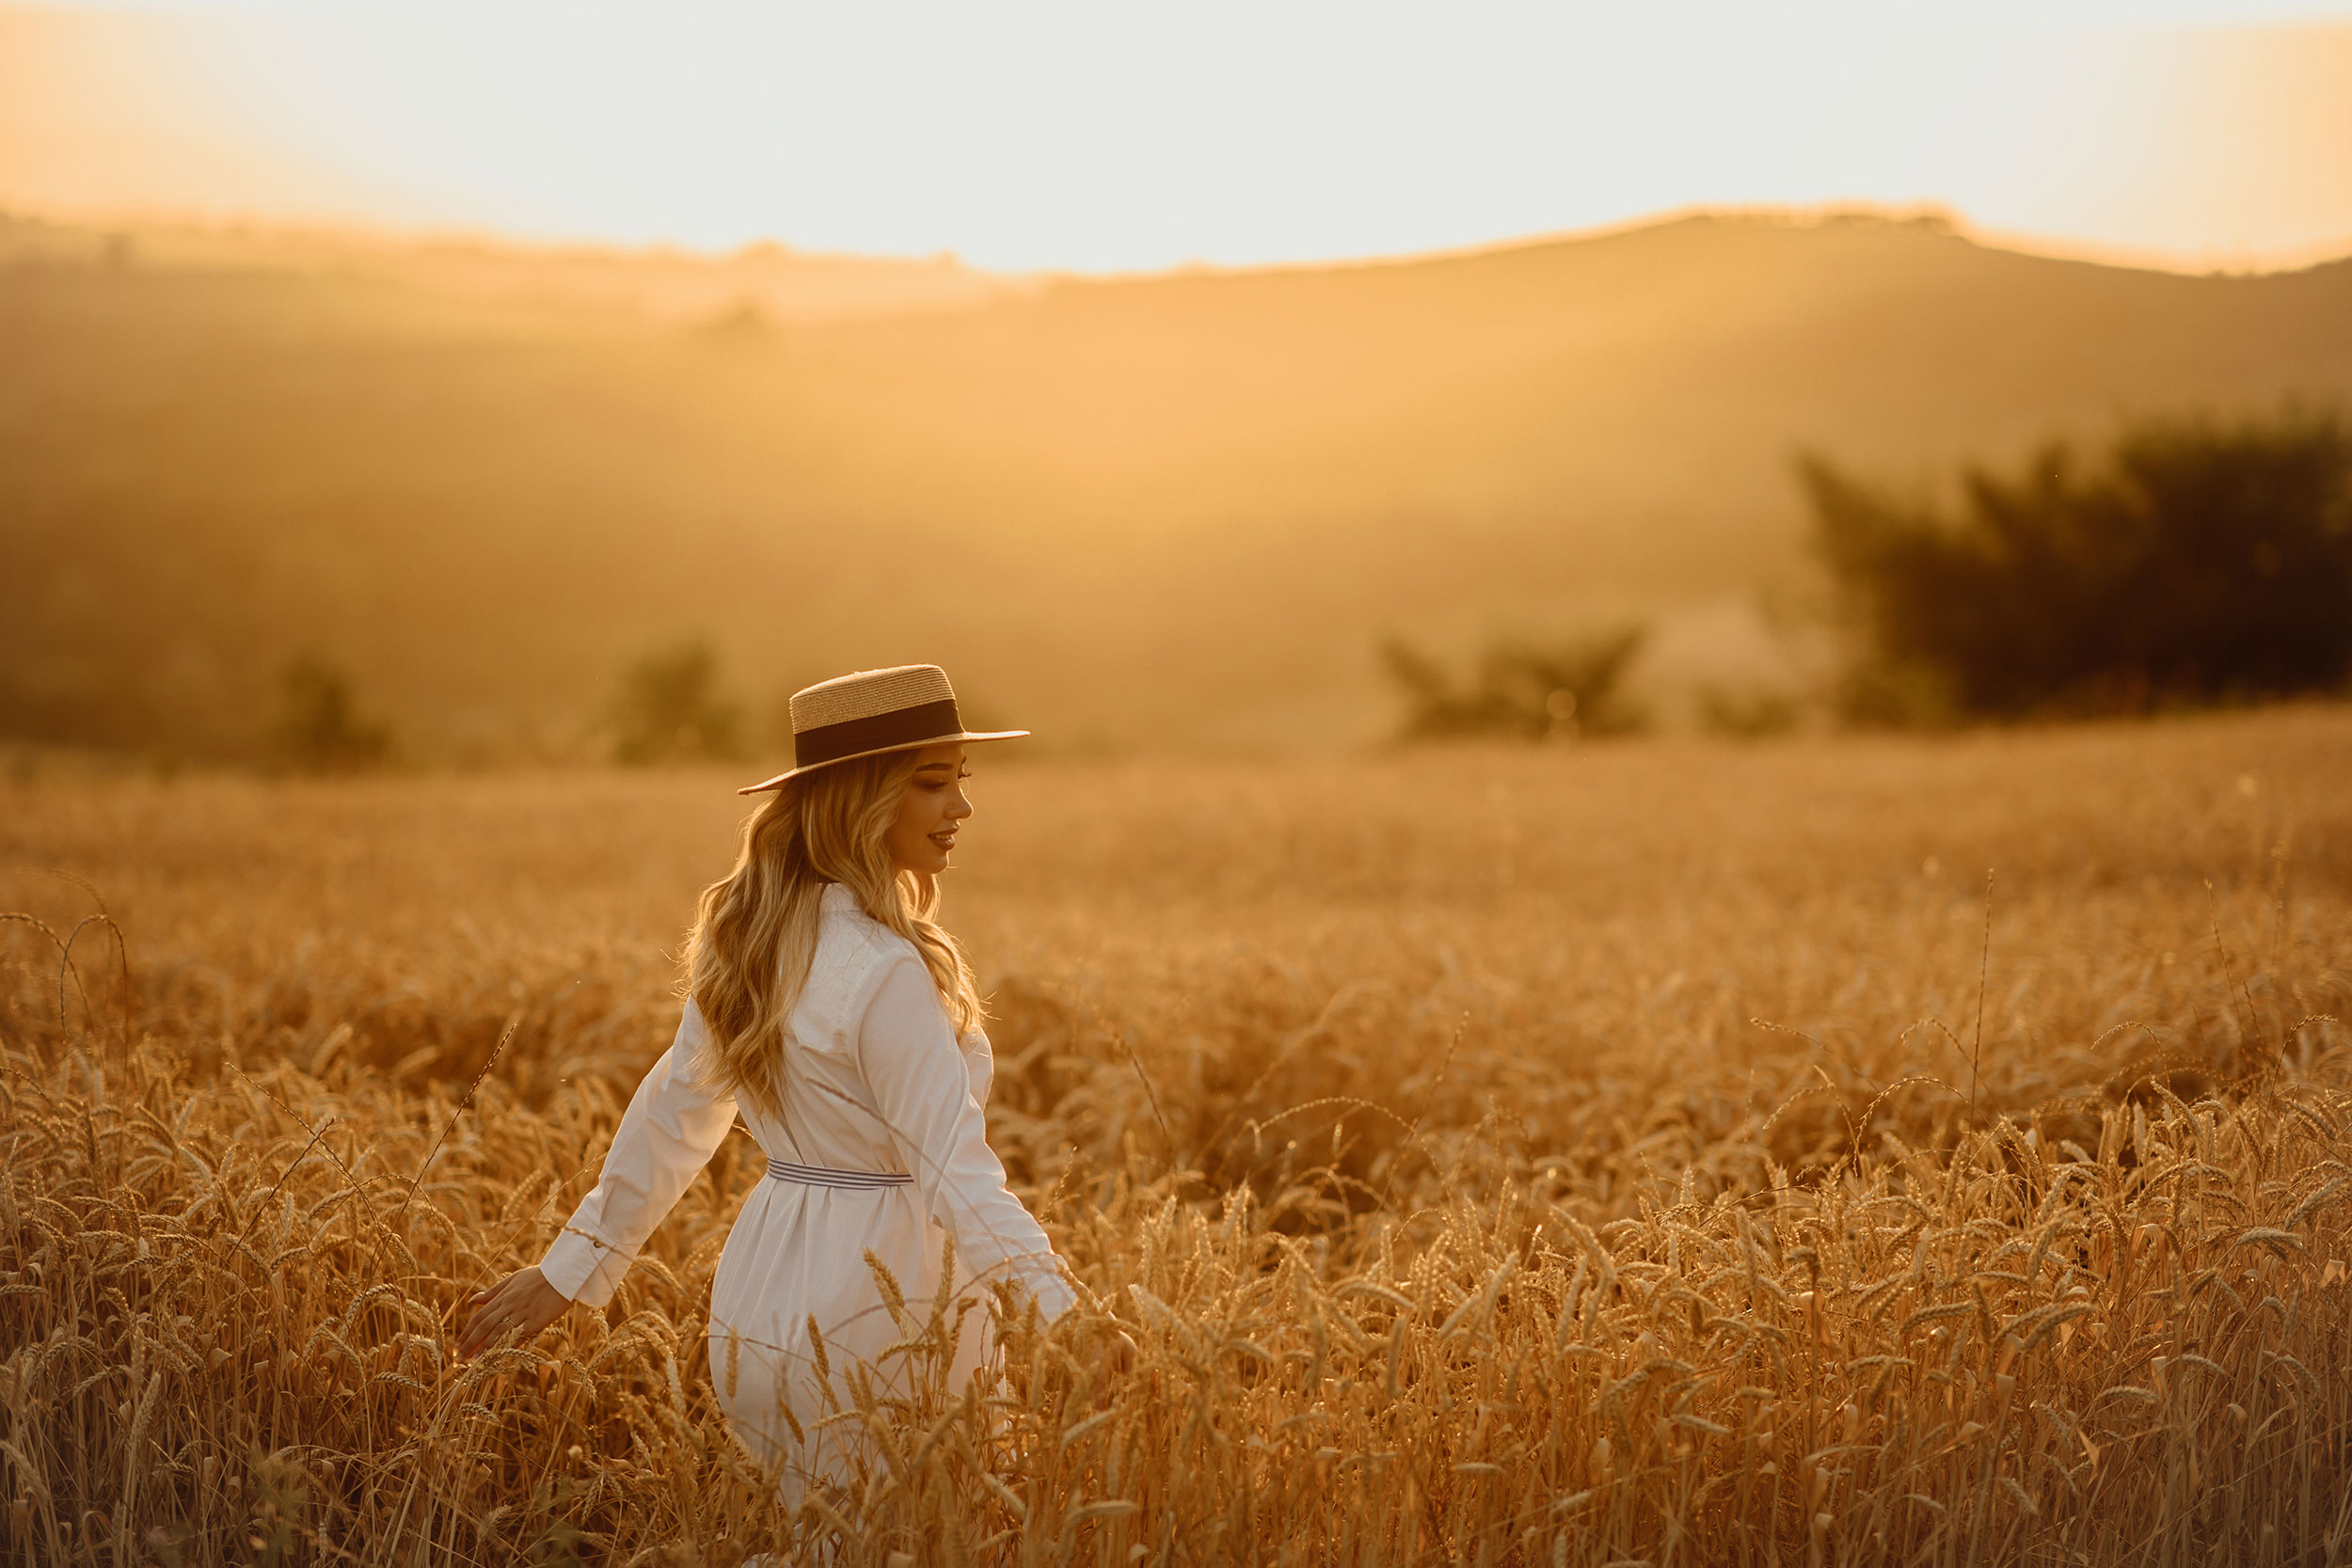 Adisa Gjo posing in a golden field during golden hour